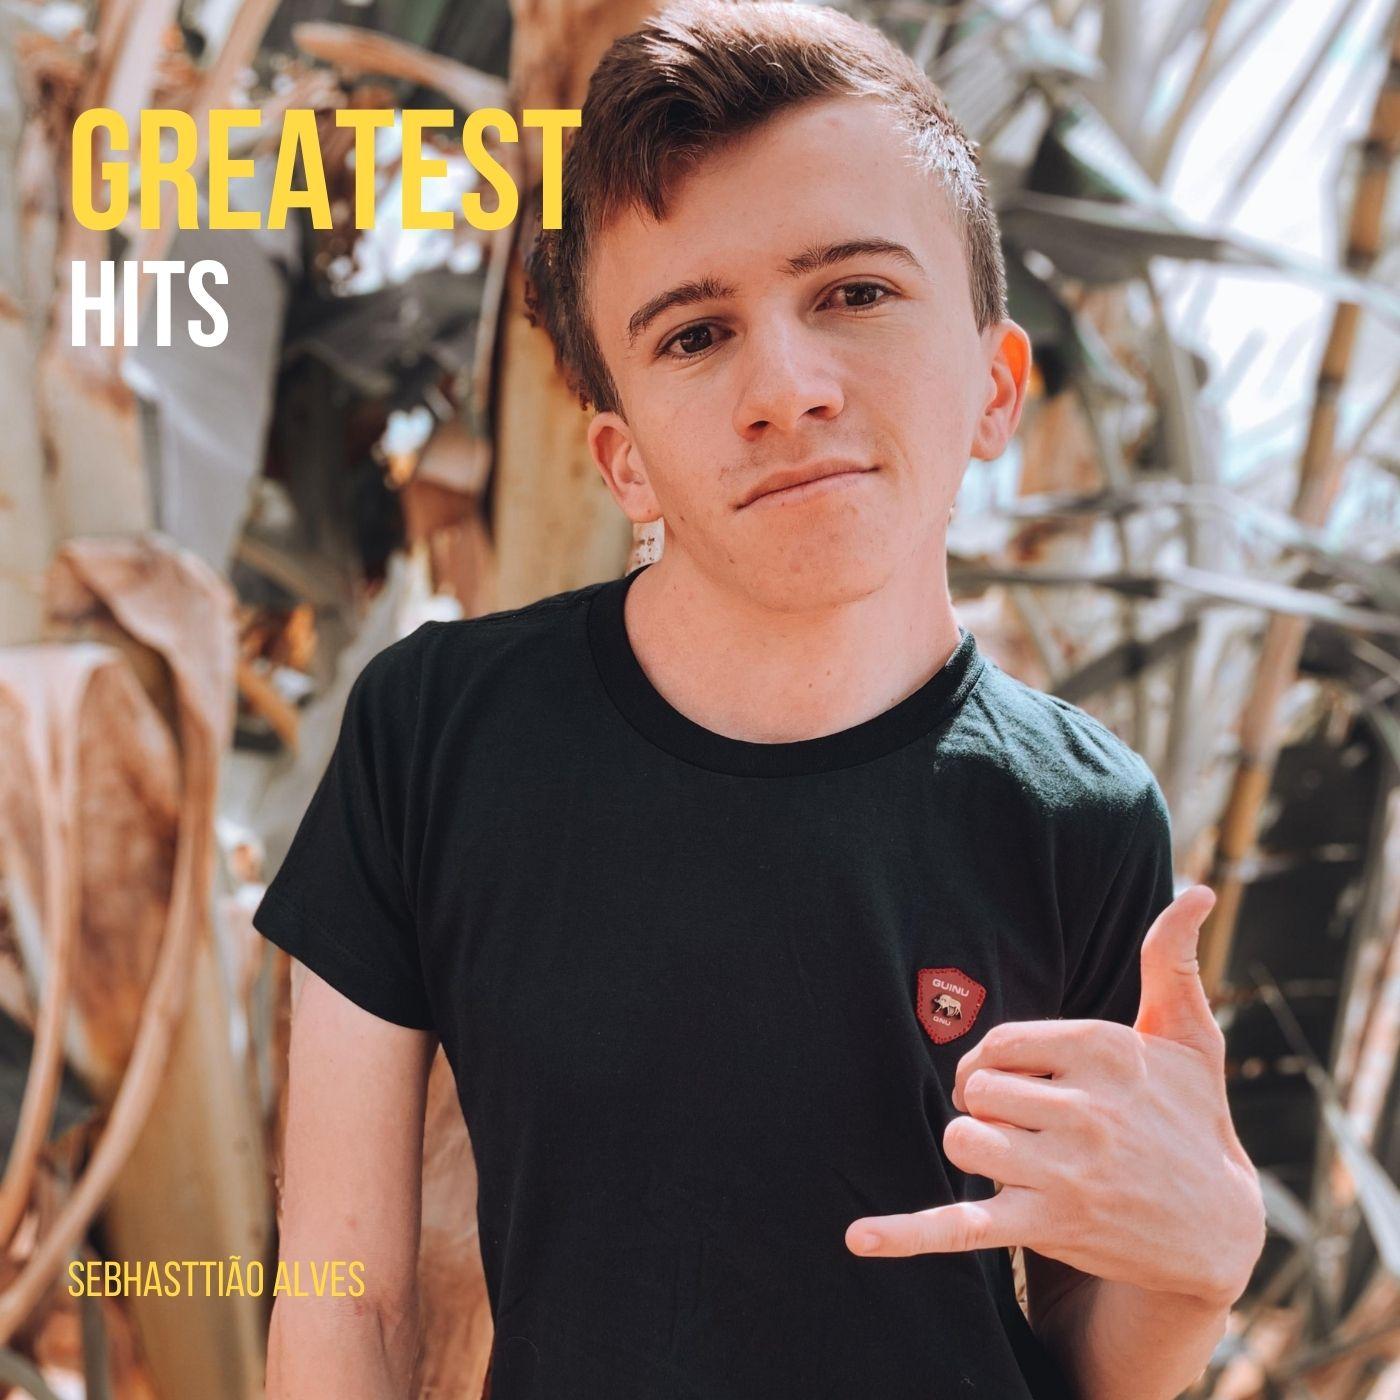 Sebhasttião Alves - Greatest hits